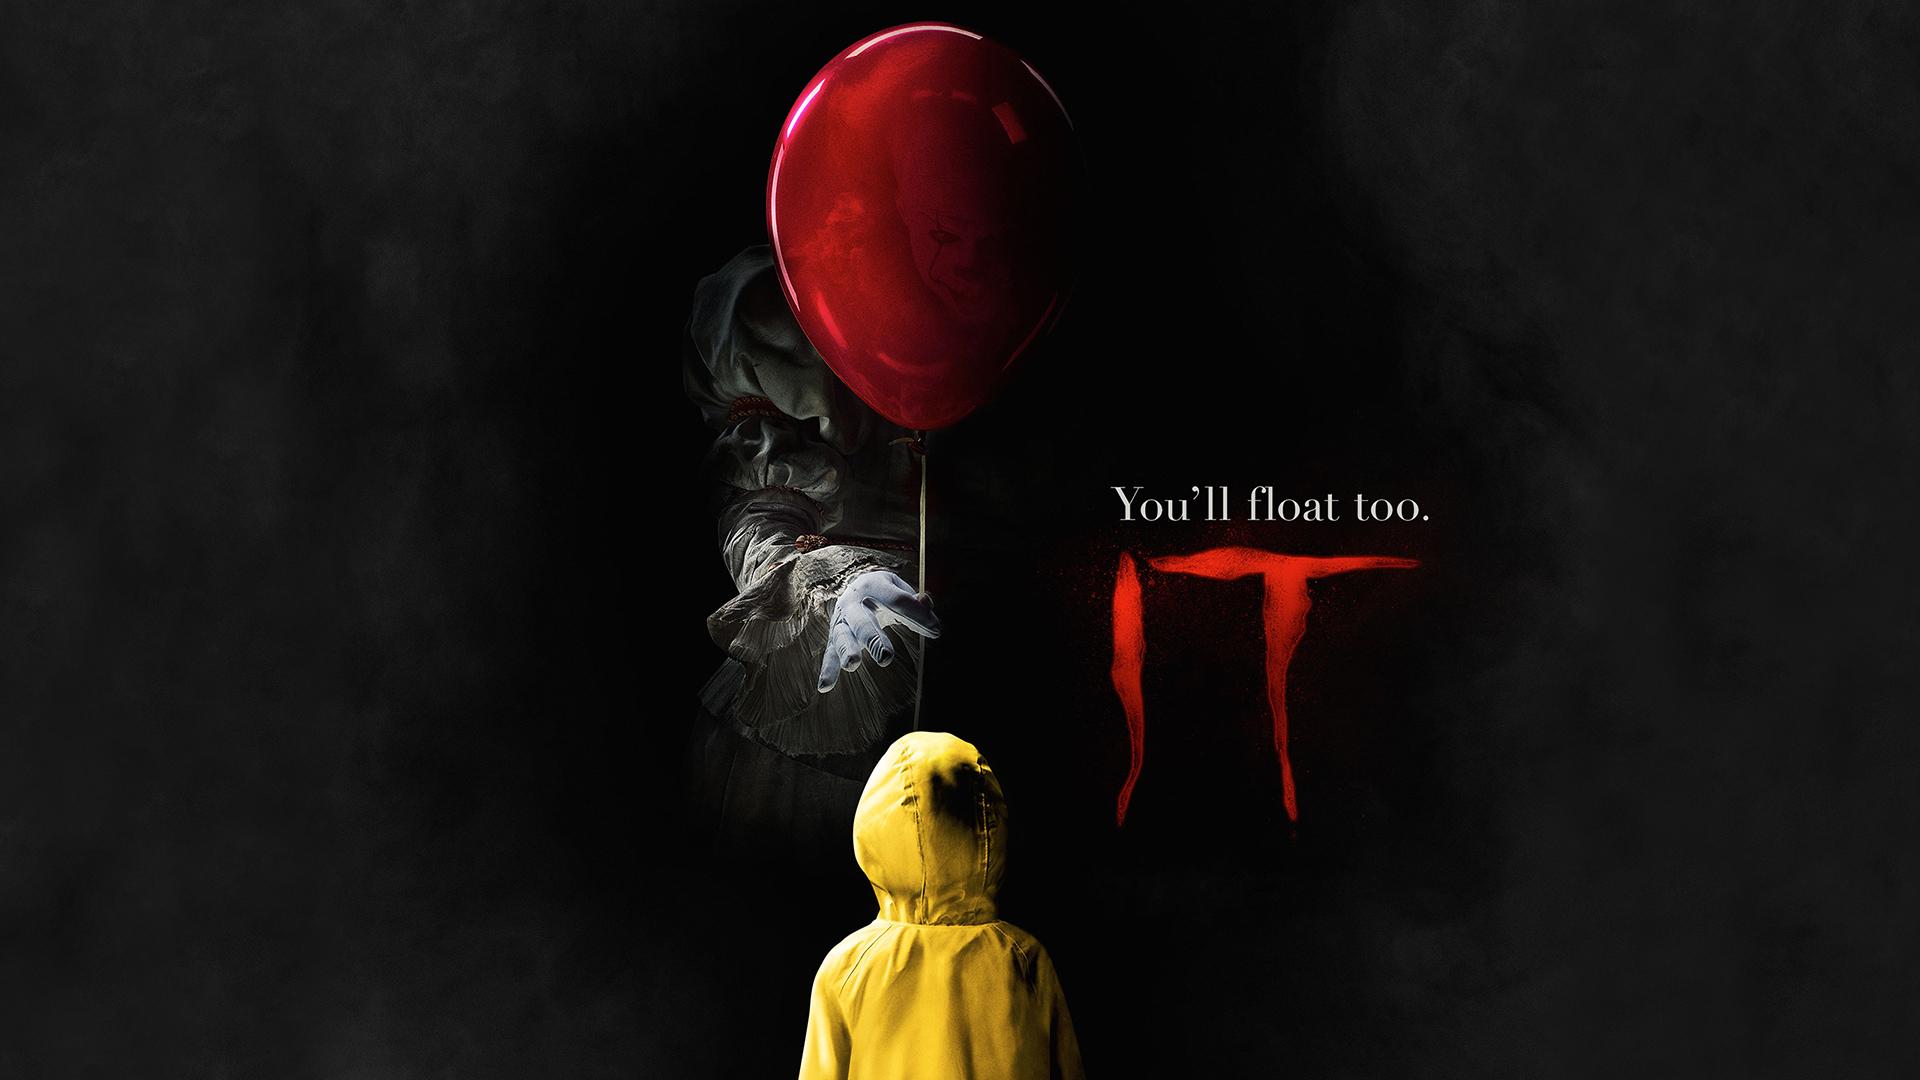 "Couverture informatique ""width ="" 1920 ""height ="" 1080 ""srcset ="" https://www.samma3a.com/tech/en/wp-content/uploads/sites/2/2018/06/it-balloon-2017 - film d'horreur-1613.jpg 1920w, https://www.samma3a.com/tech/en/wp-content/uploads/sites/2/2018/06/it-balloon-2017-horror-movie-1613-300x169. jpg 300w, https://www.samma3a.com/tech/en/wp-content/uploads/sites/2/2018/06/it-balloon-2017-horror-movie-1613-768x432.jpg 768w, https: //www.samma3a.com/tech/en/wp-content/uploads/sites/2/2018/06/it-balloon-2017-horror-movie-1613-1024x576.jpg 1024w, https: // www. samma3a.com/tech/en/wp-content/uploads/sites/2/2018/06/it-balloon-2017-horror-movie-1613-696x392.jpg 696w, https://www.samma3a.com/tech /en/wp-content/uploads/sites/2/2018/06/it-balloon-2017-horror-movie-1613-1068x601.jpg 1068w, https://www.samma3a.com/tech/en/wp- contenu / téléchargements / sites / 2/2018/06 / it-balloon-2017-horror-movie-1613-747x420.jpg 747w ""size ="" (largeur max: 1920px) 100vw, 1920px"